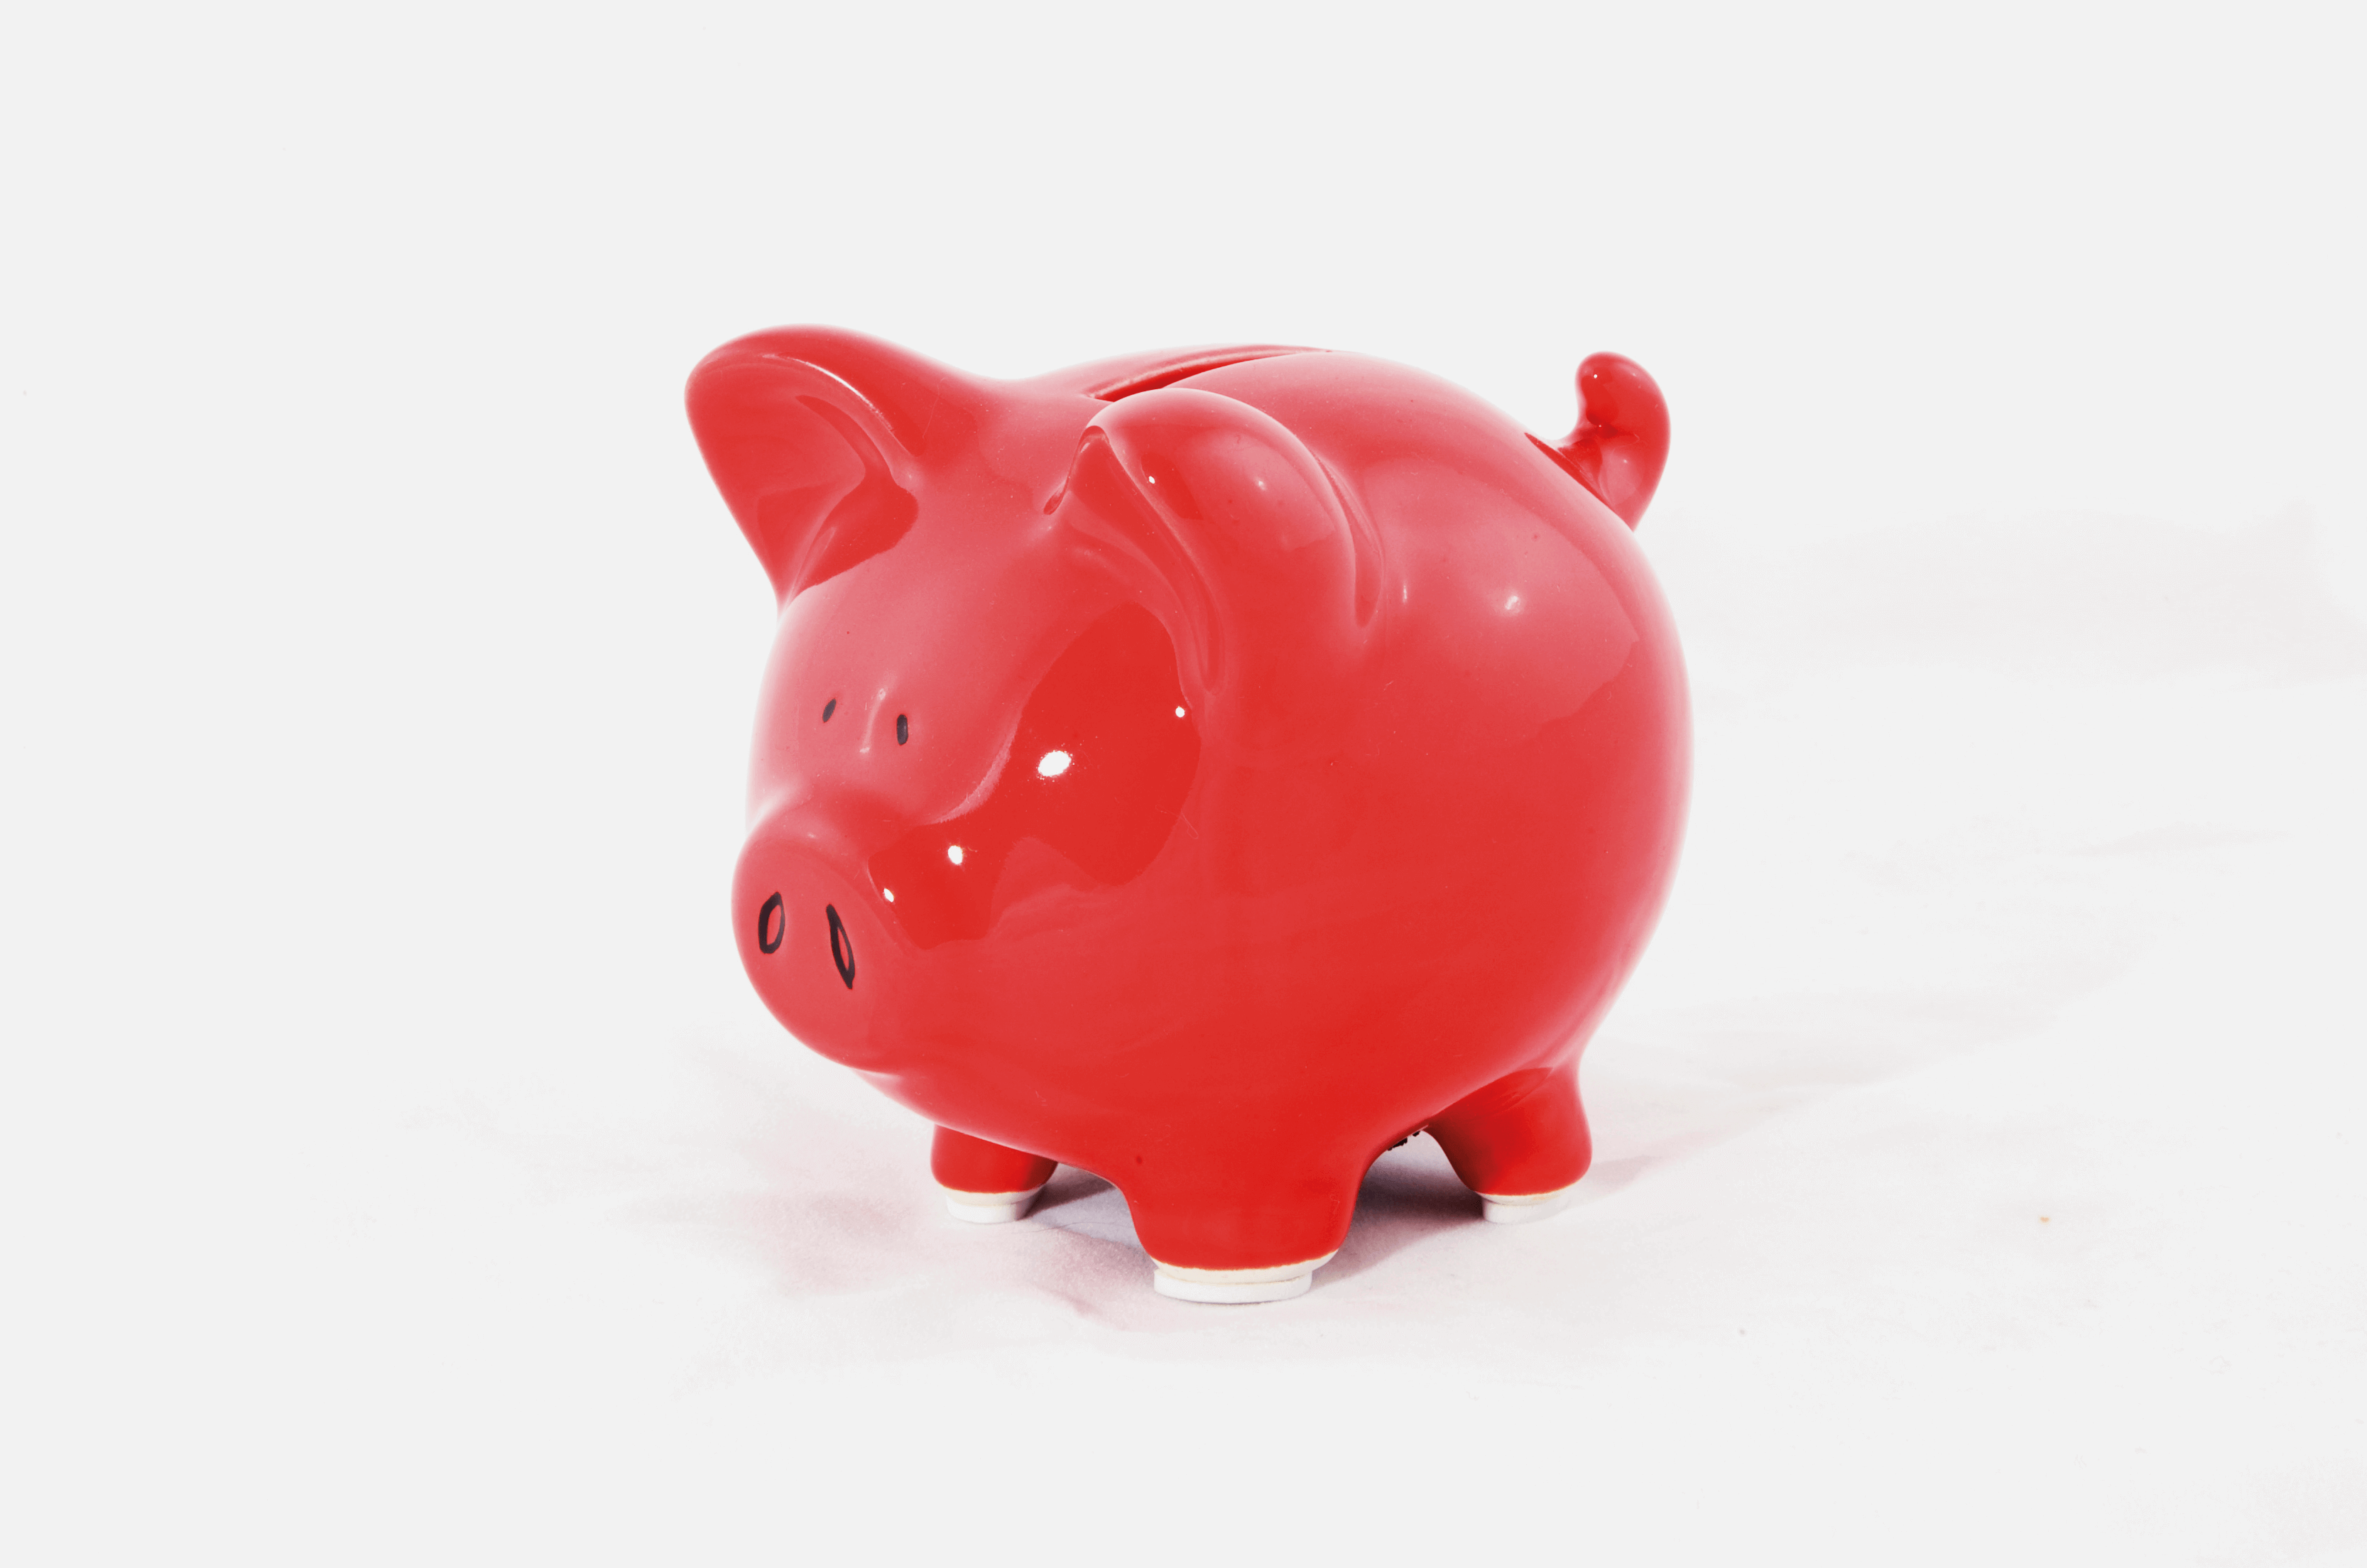 Financiën geld ouders